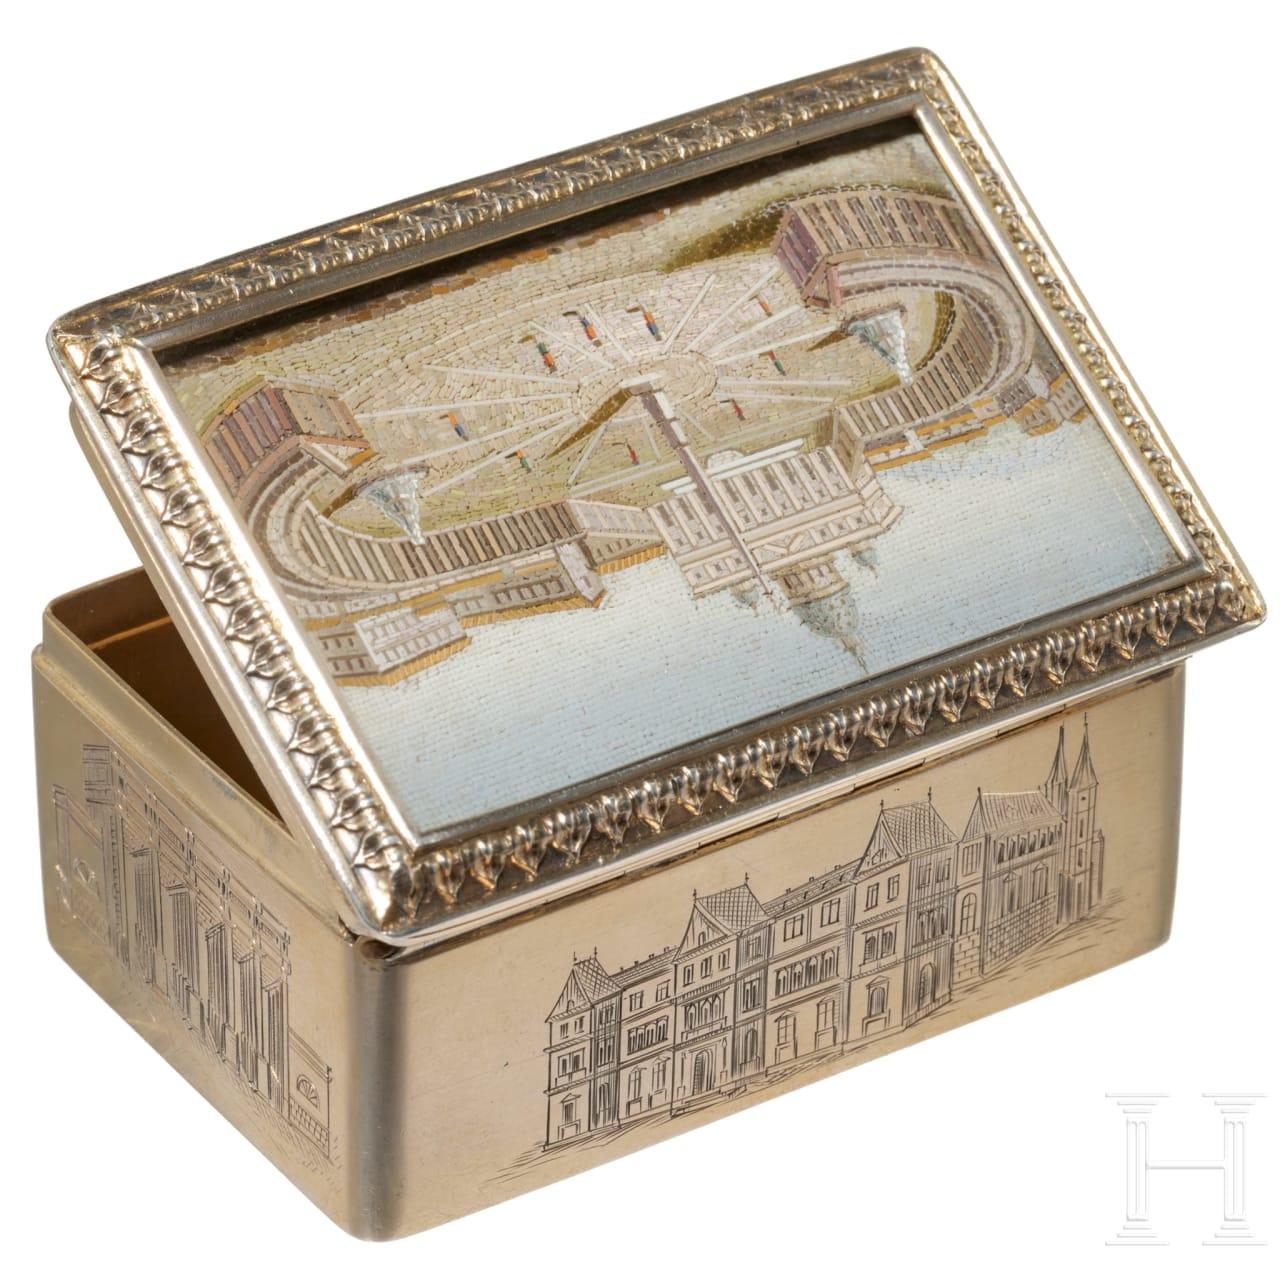 A Viennese silver gilt box with micro-mosaic, 19th century